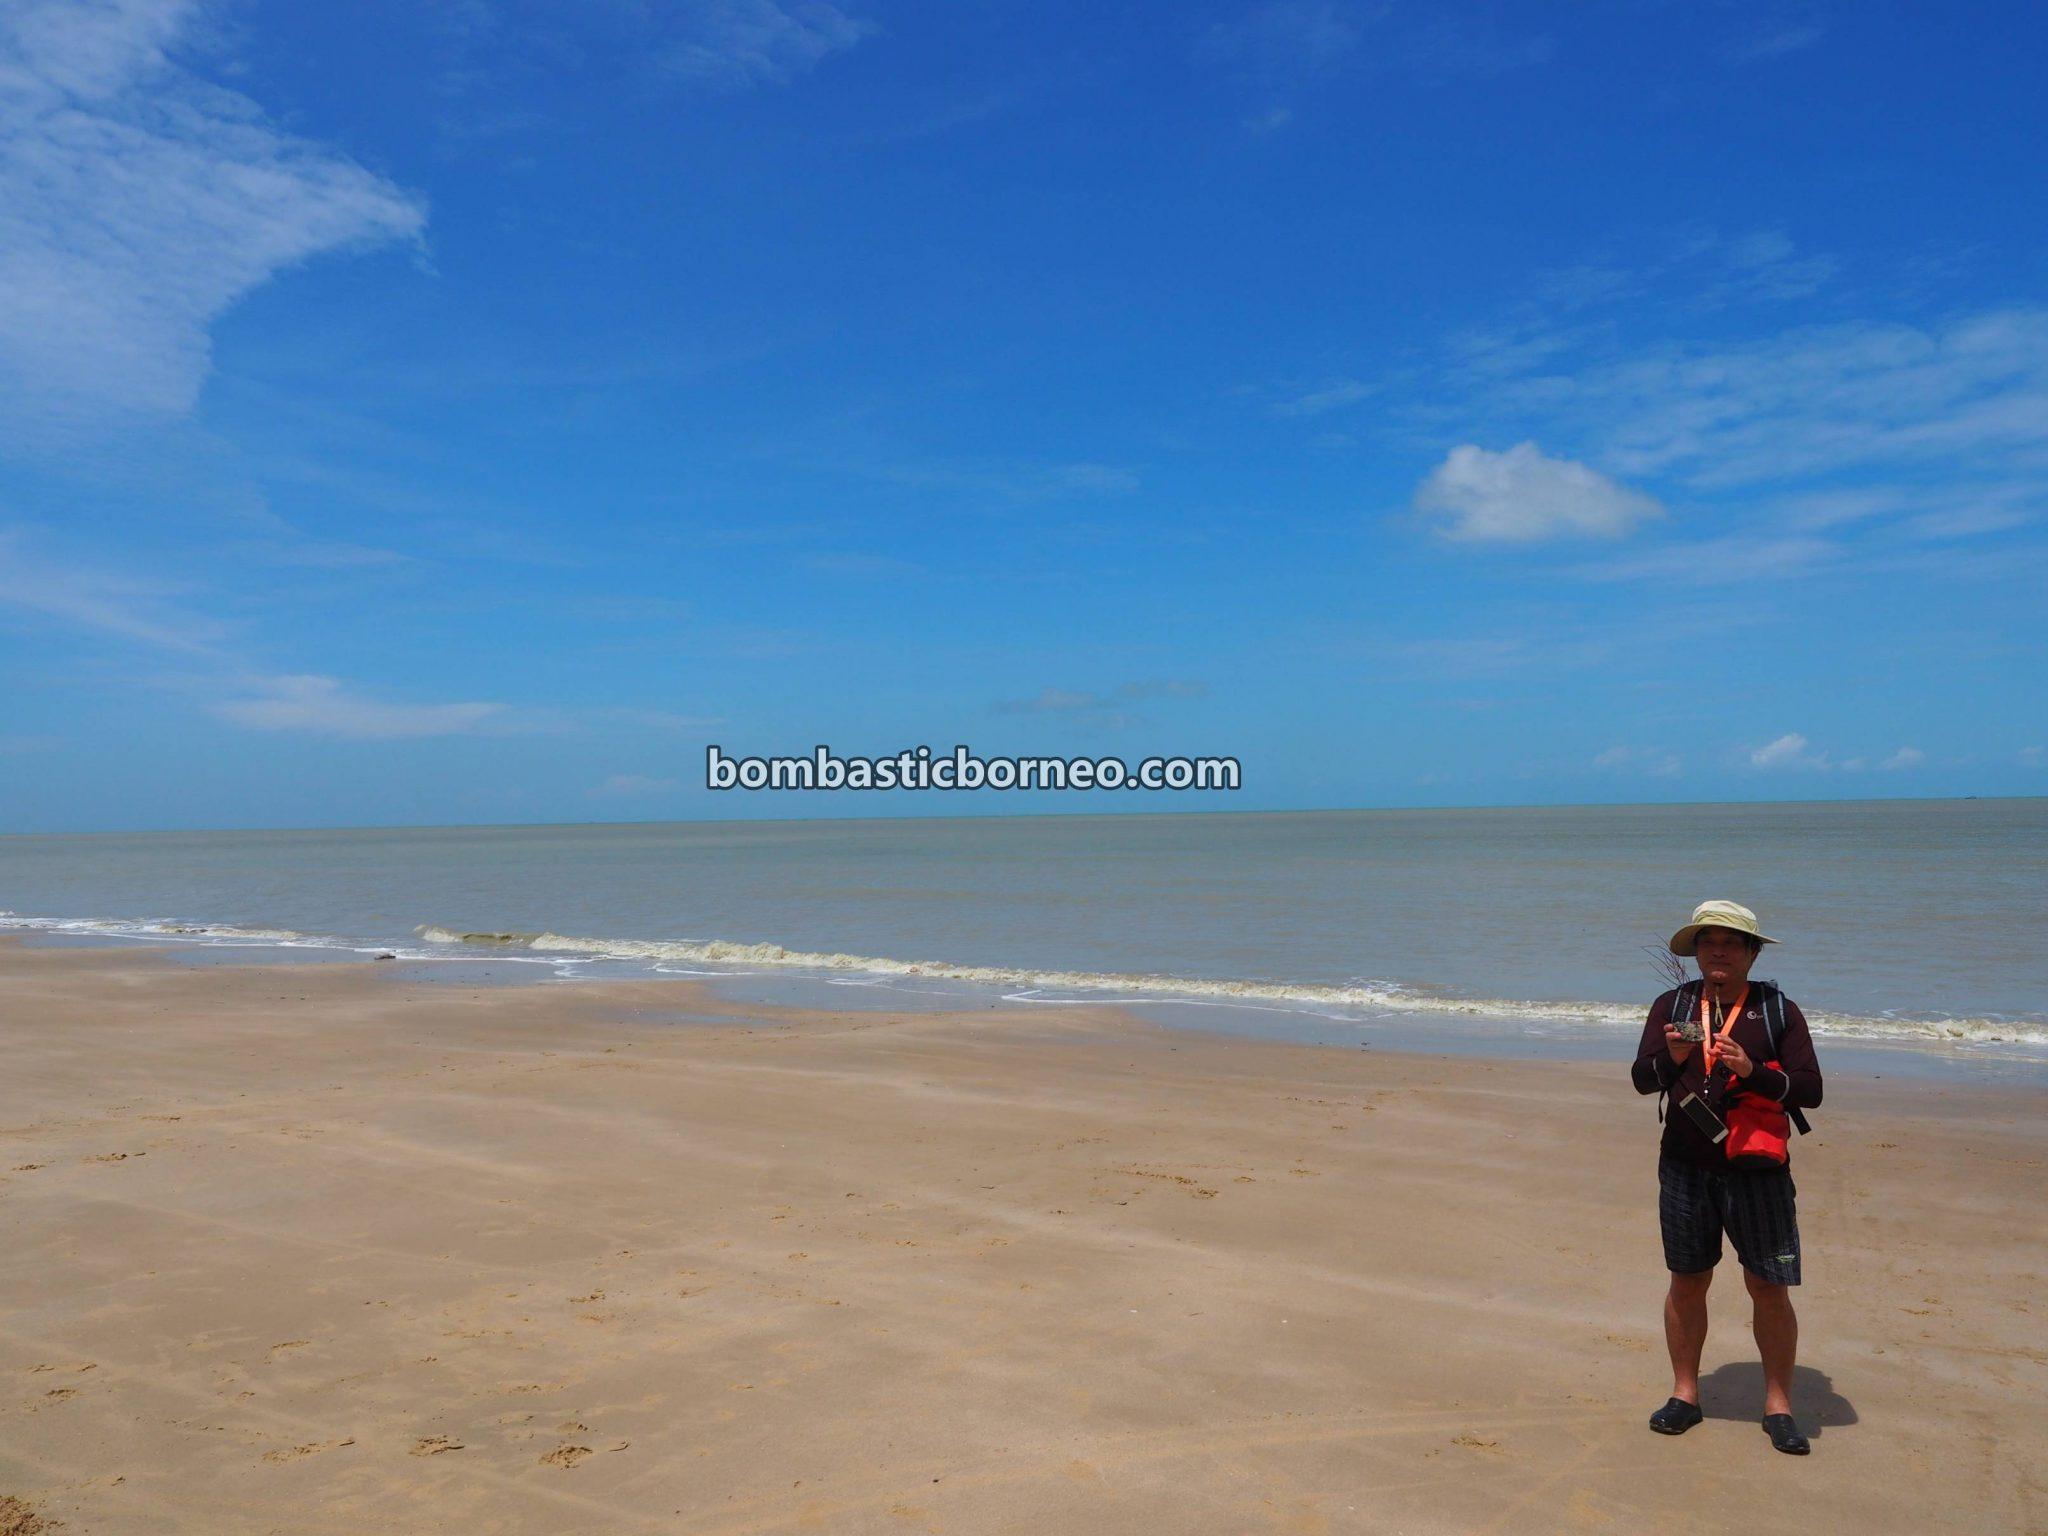 Pantai Putri Serayi, beach, nature, fishing village, Kampung Melayu, Sambas, Indonesia, West Kalimantan, Jawai Laut, wisata alam, Tourism, travel guide, destination, Borneo, Trans Border